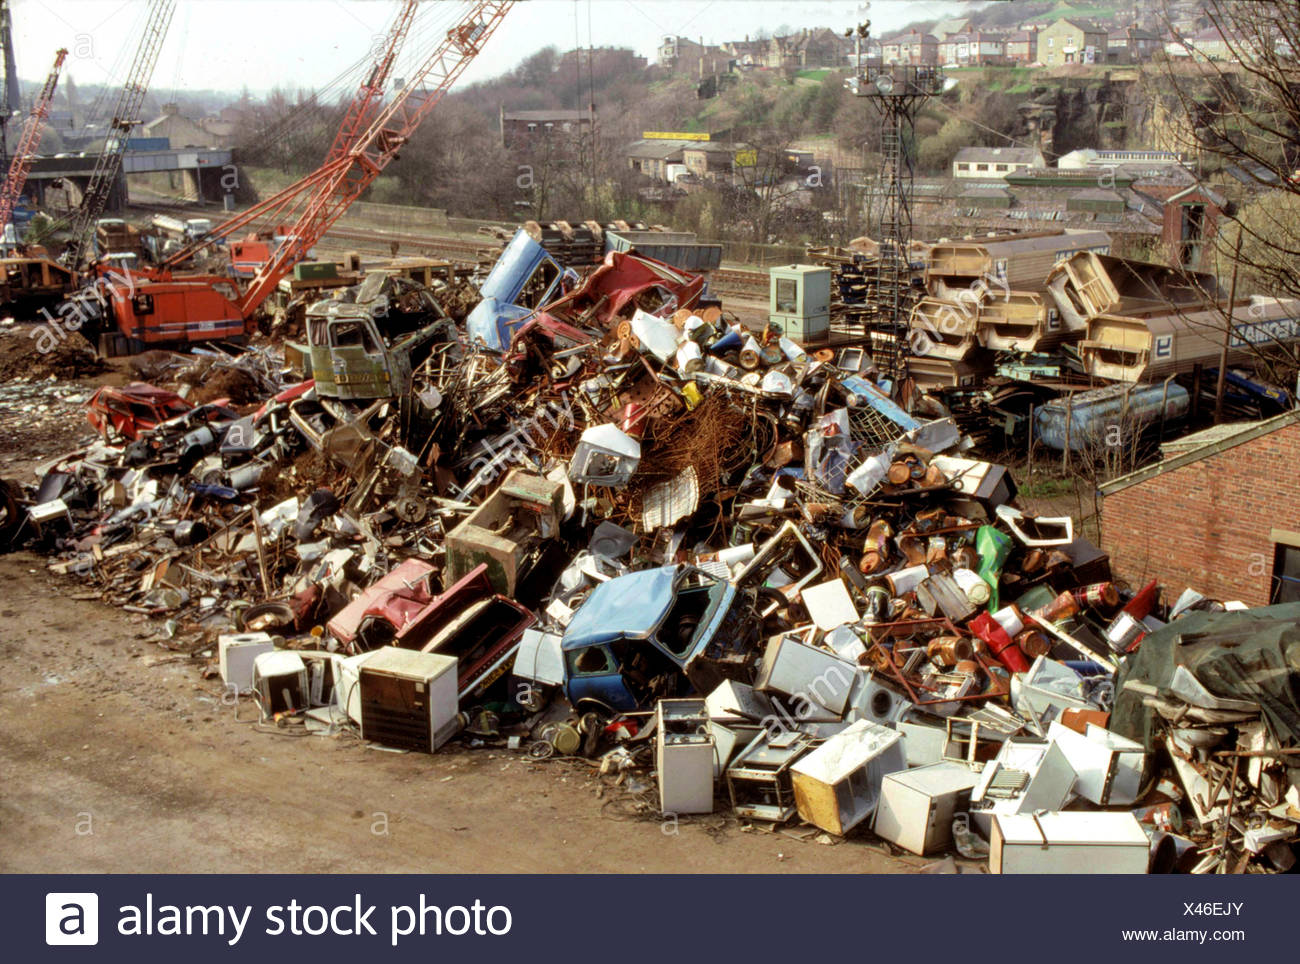 Scrap yard in the UK Stock Photo